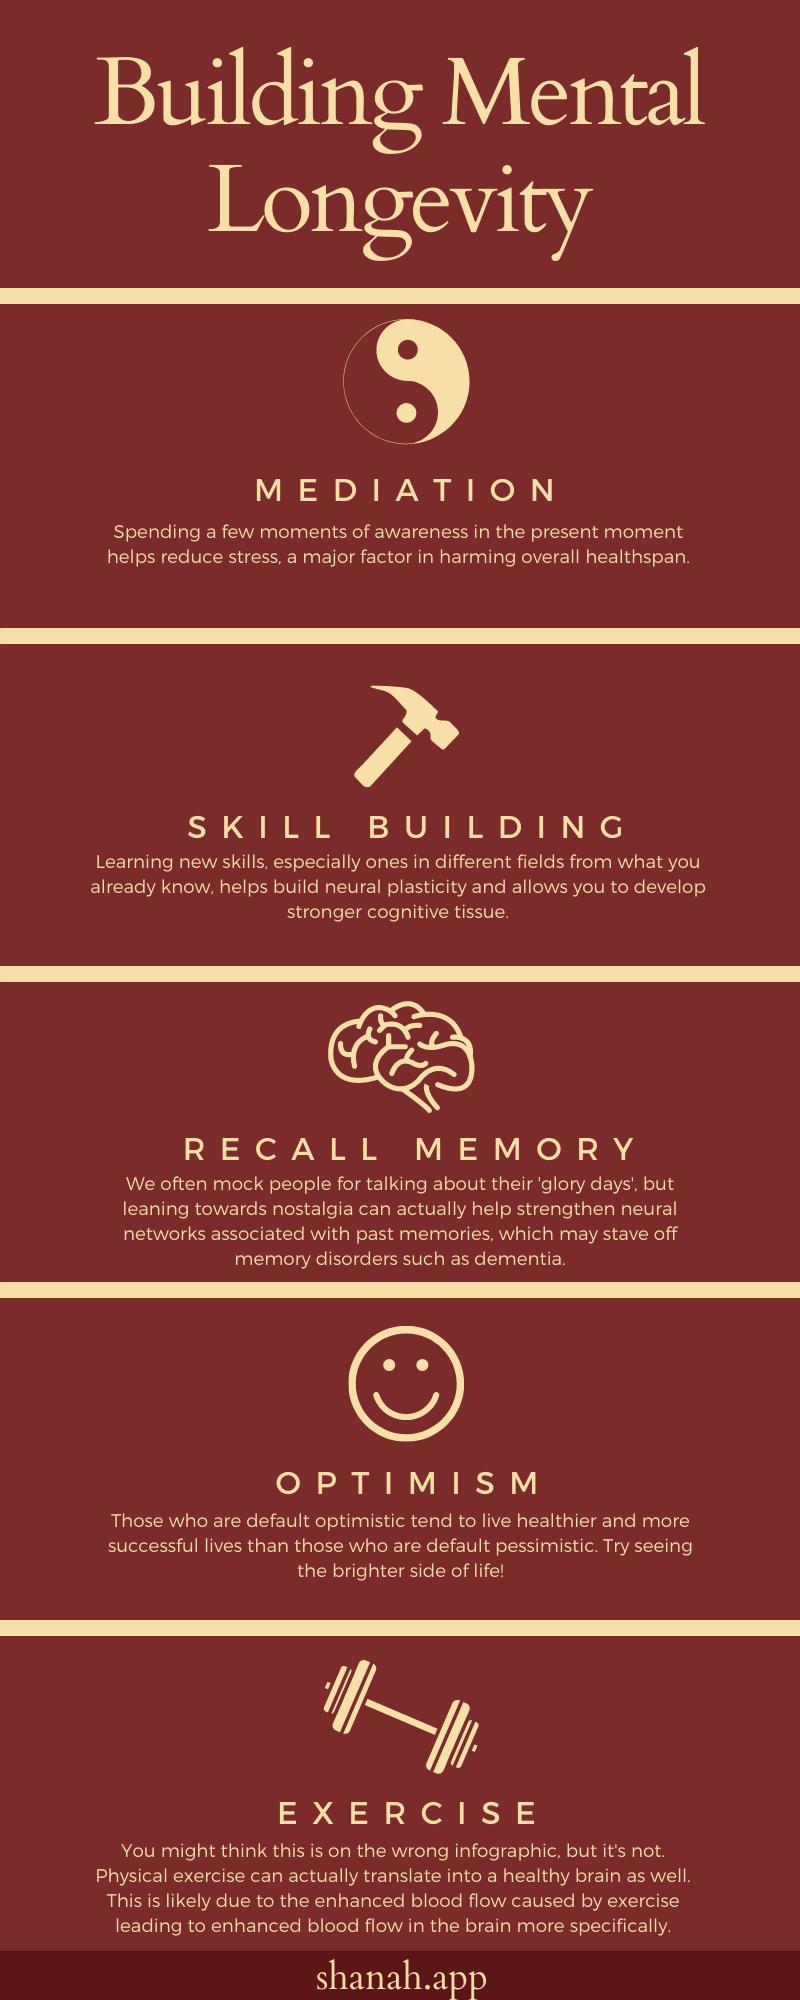 Here's the Mental Longevity Infographic